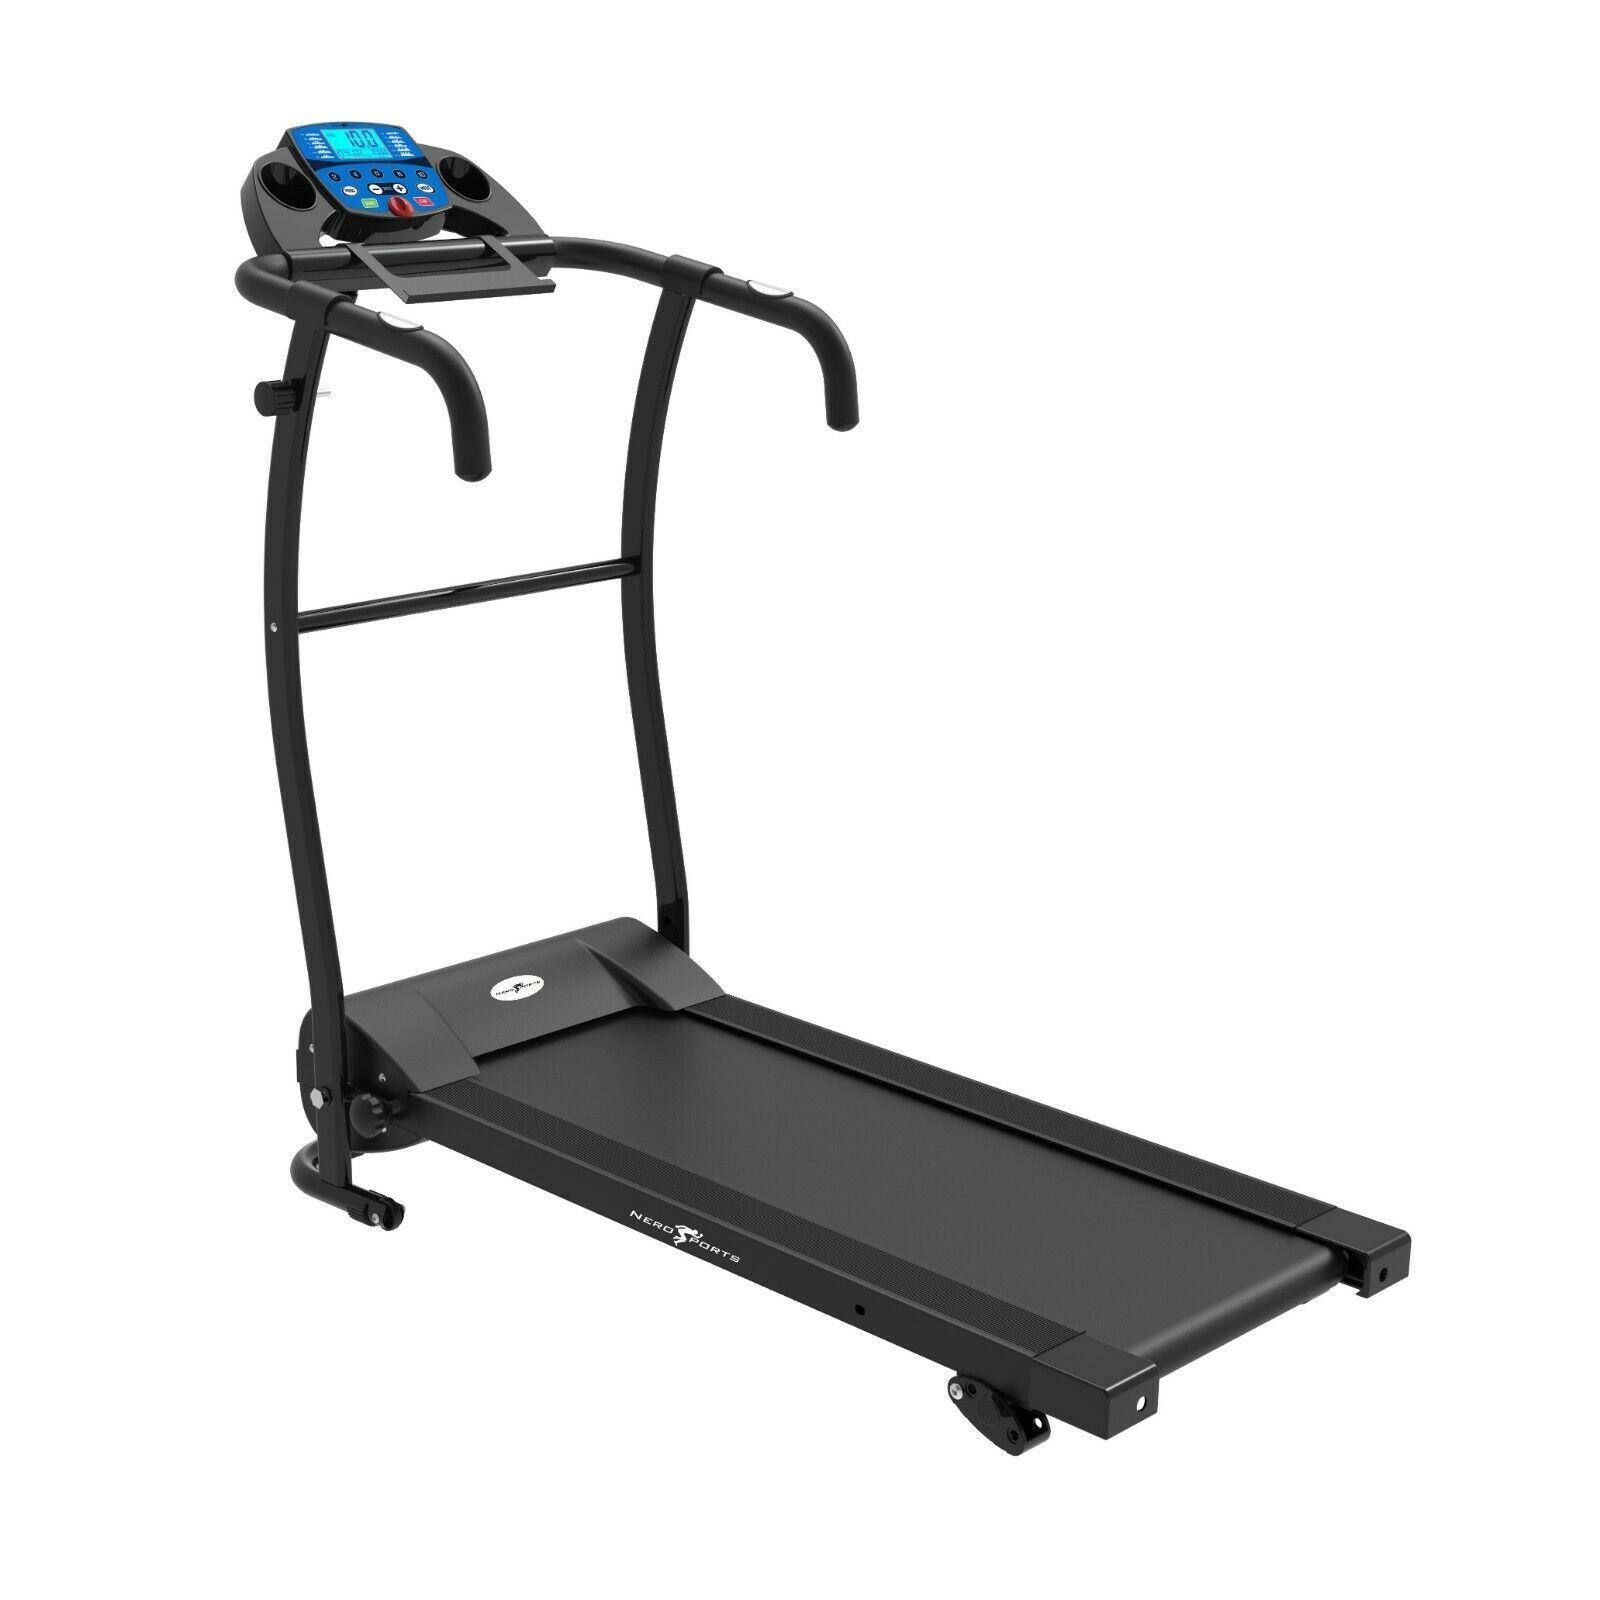 TREADMILL NERO PRO Electric Folding Running Machine w Bluetooth